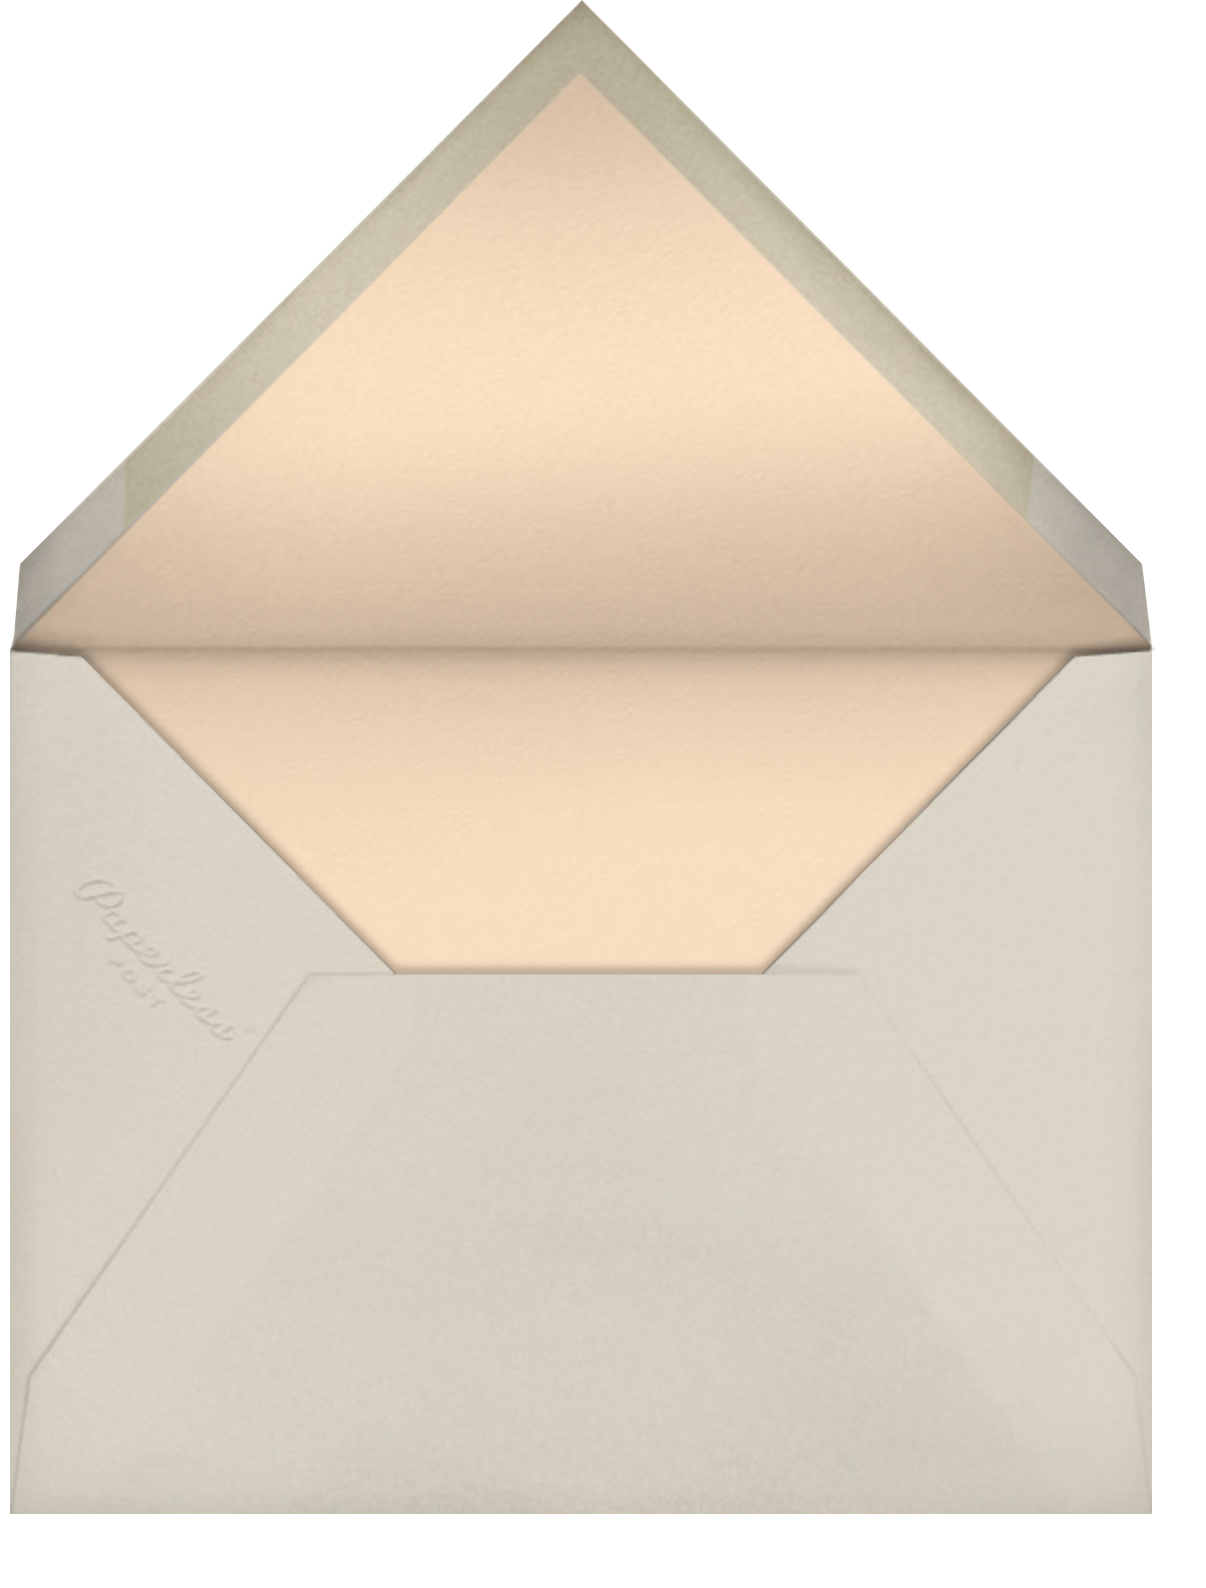 Vellum - Paperless Post - Envelope